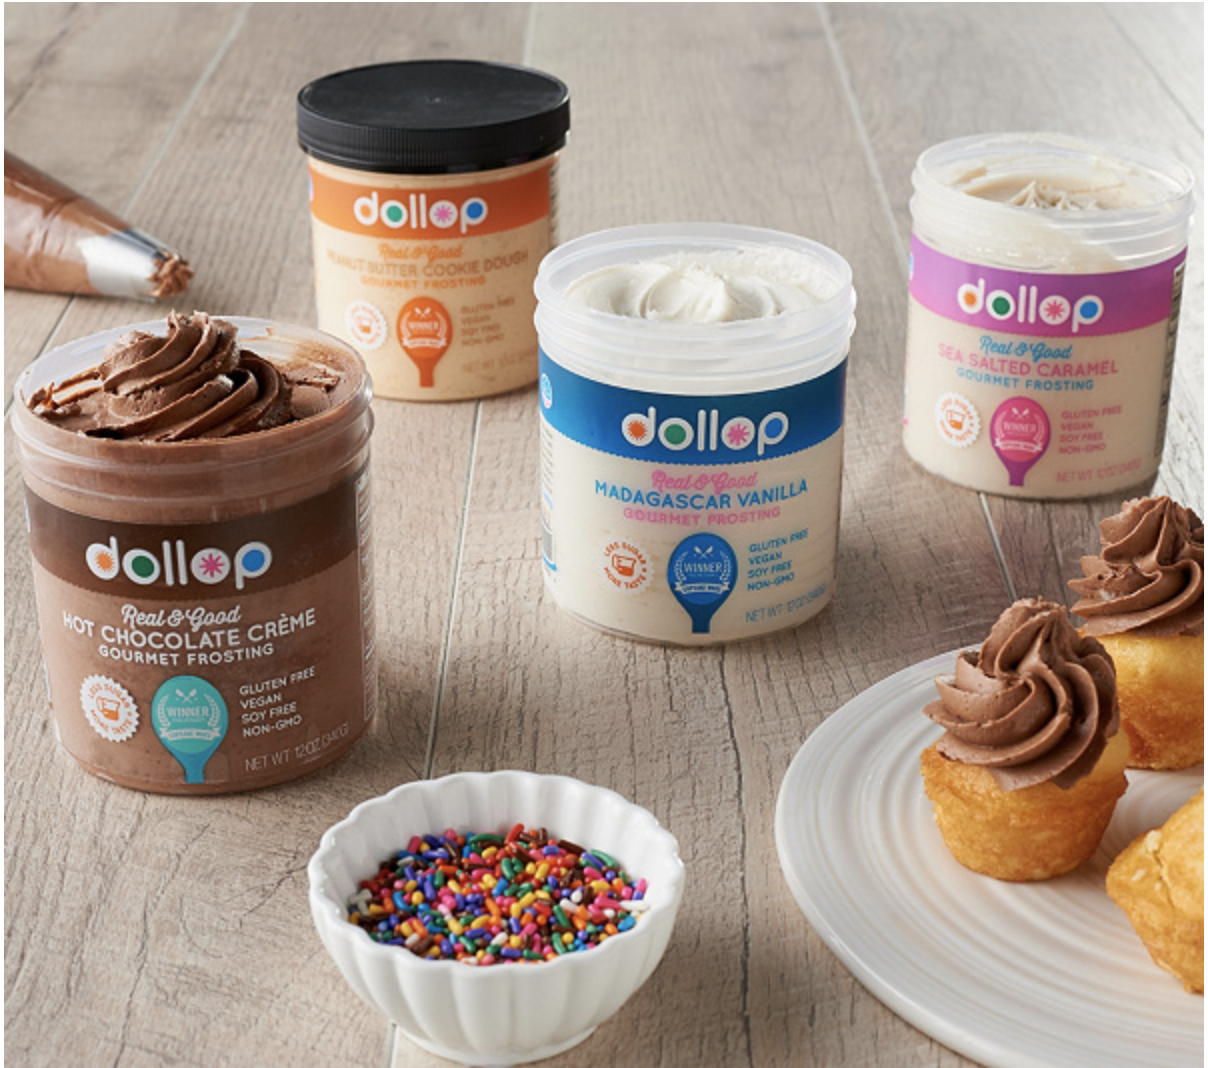 dollop-gourmet